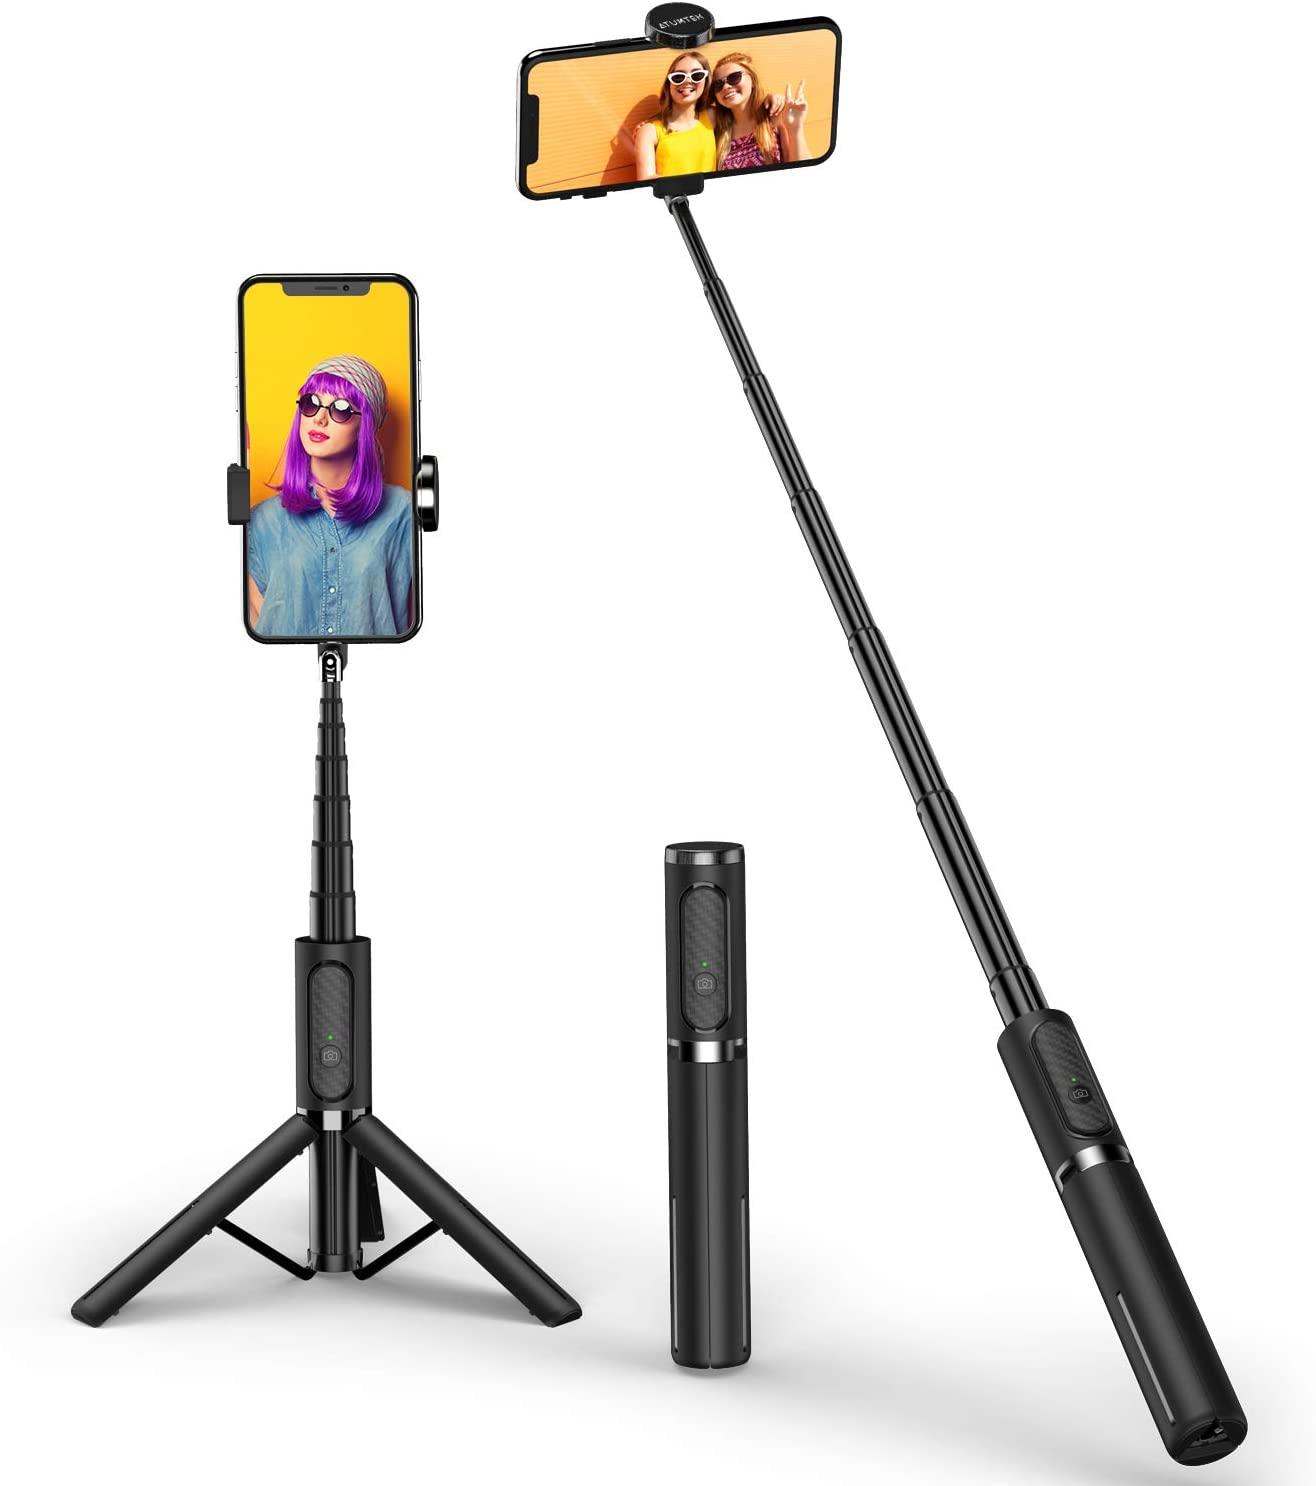 Top 5 Google Pixel 2 XL Selfie Stick